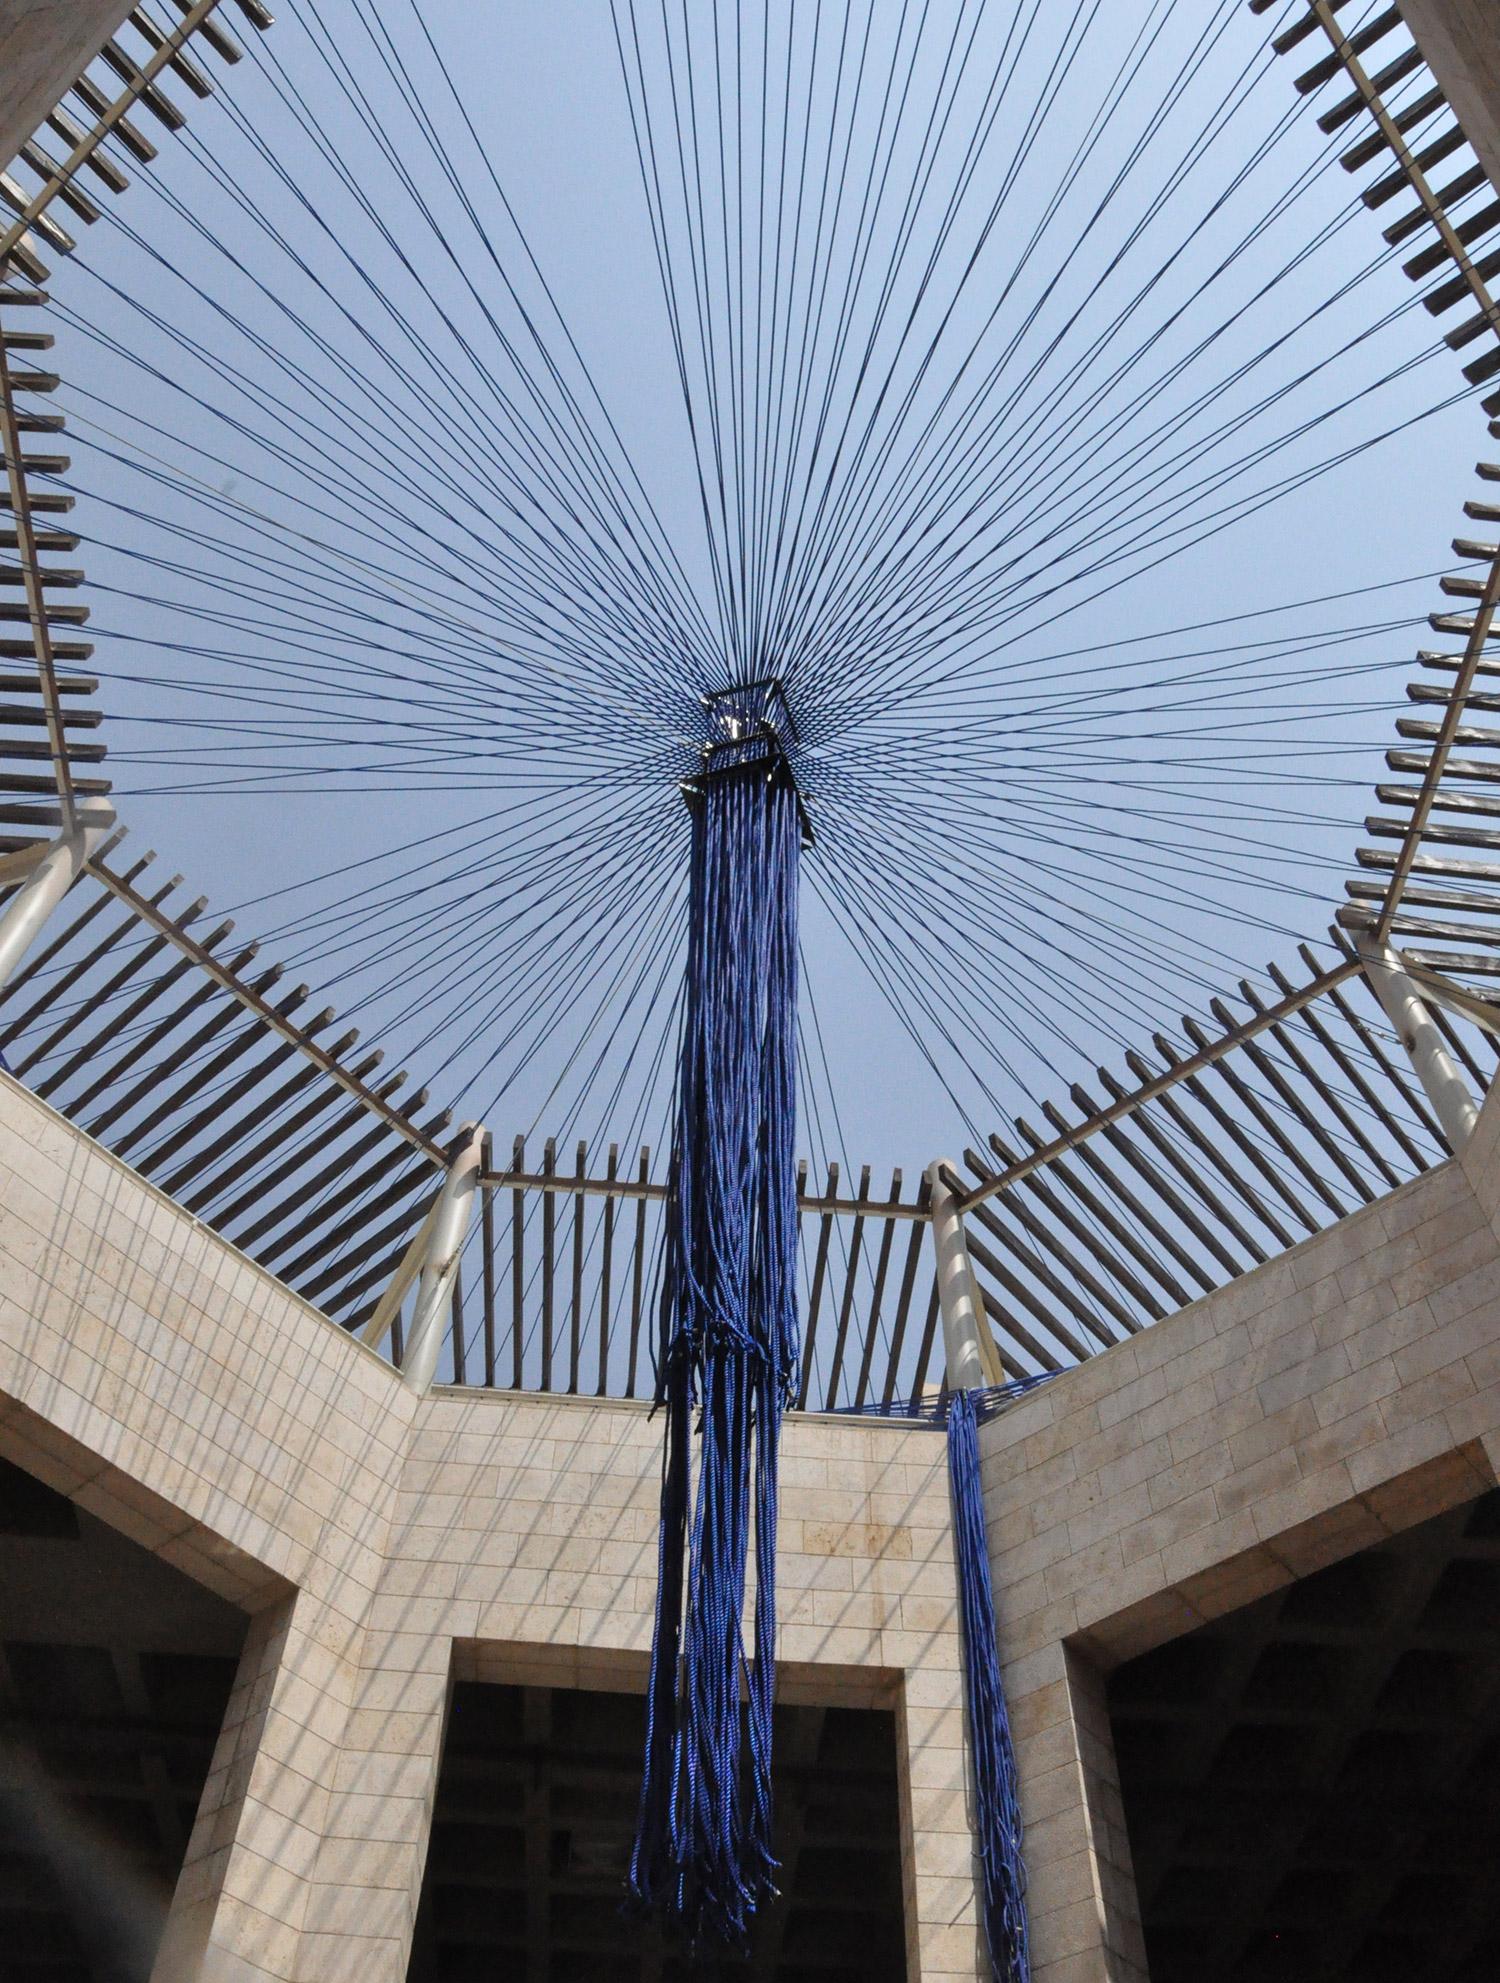 The Loom